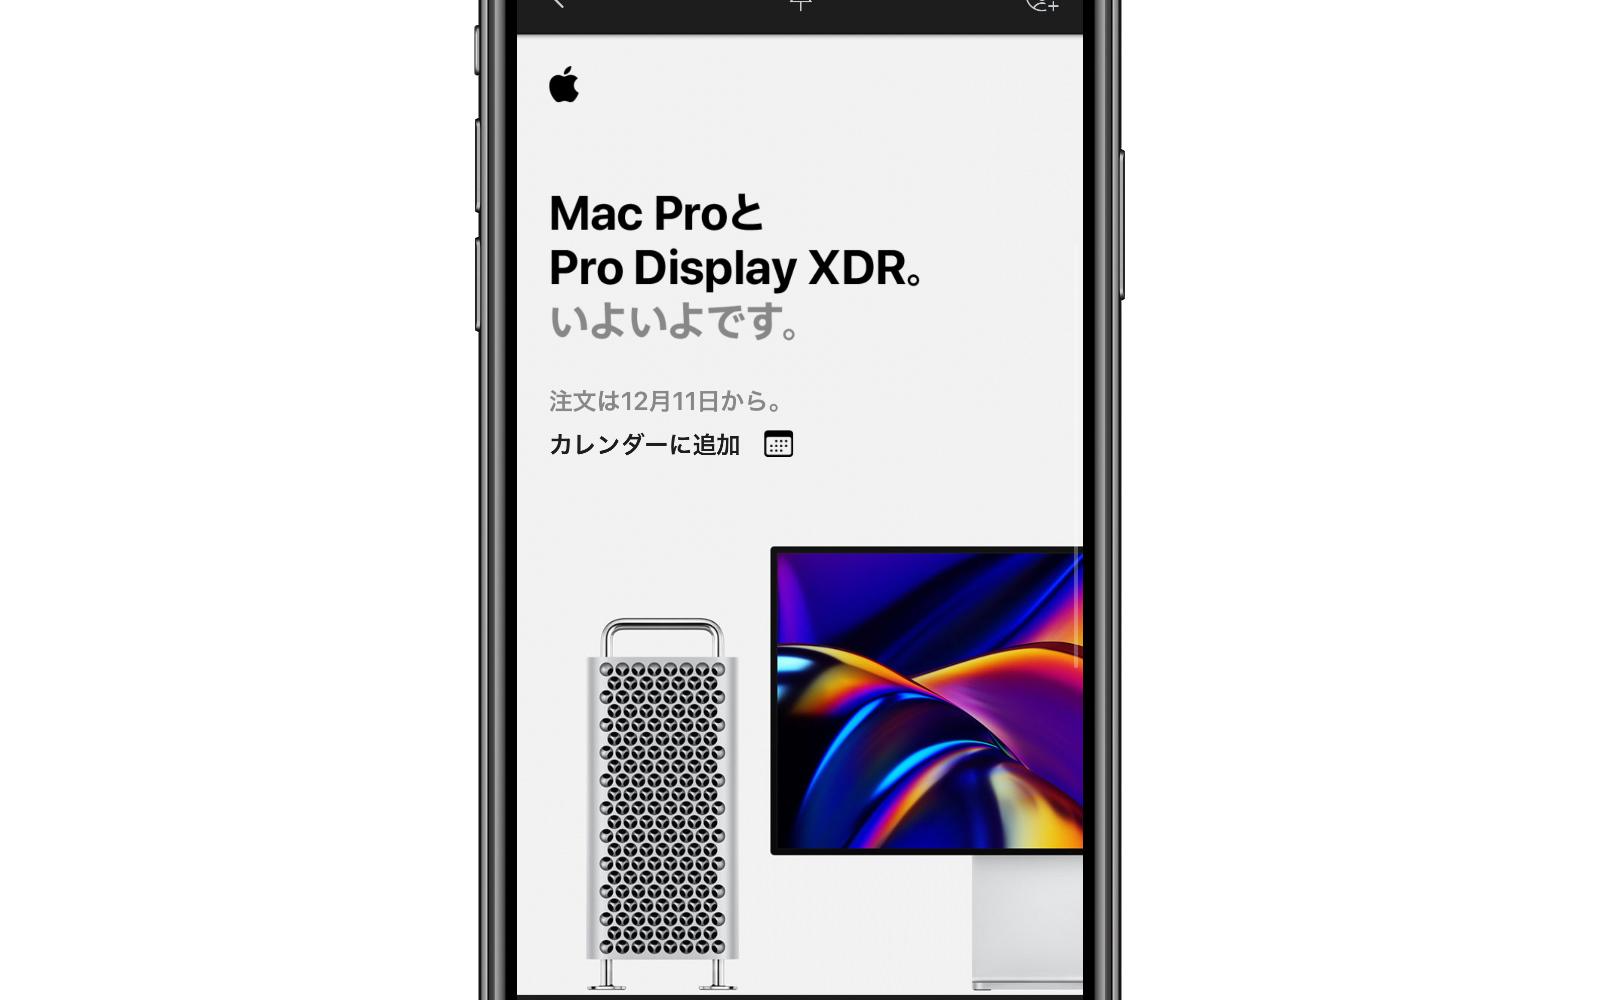 Mac Pro ProDisplayXDR on sale